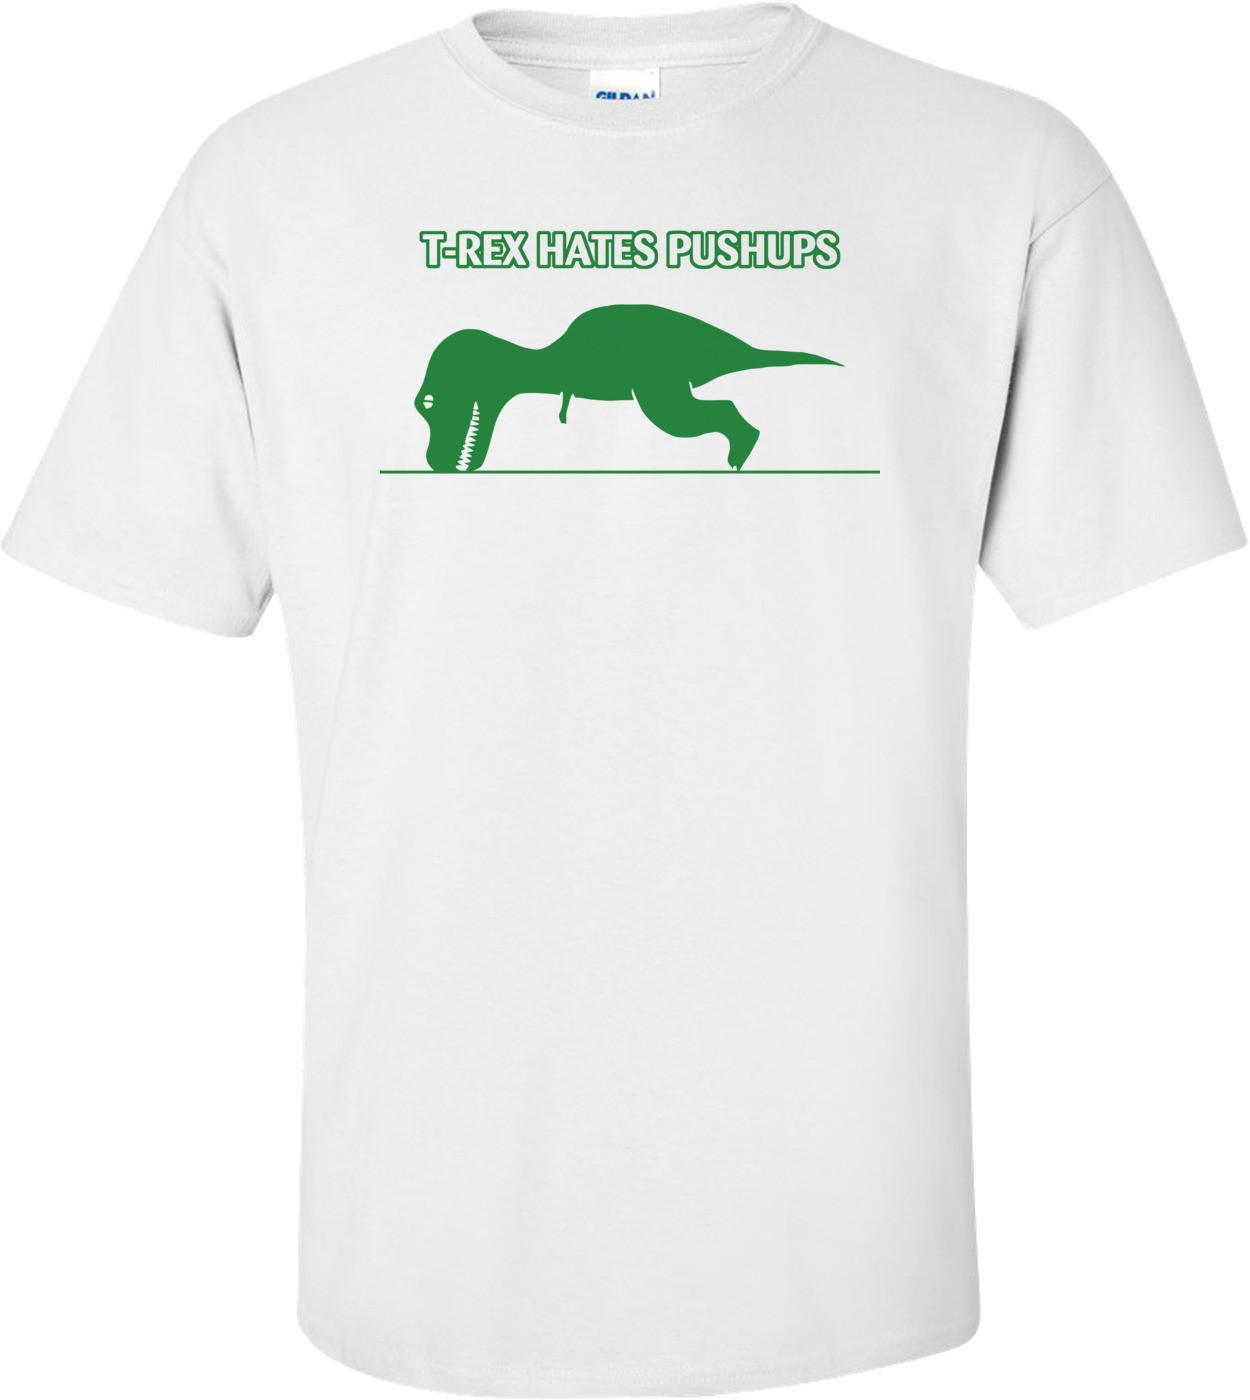 T-rex Hates Pushups Funny T-shirt